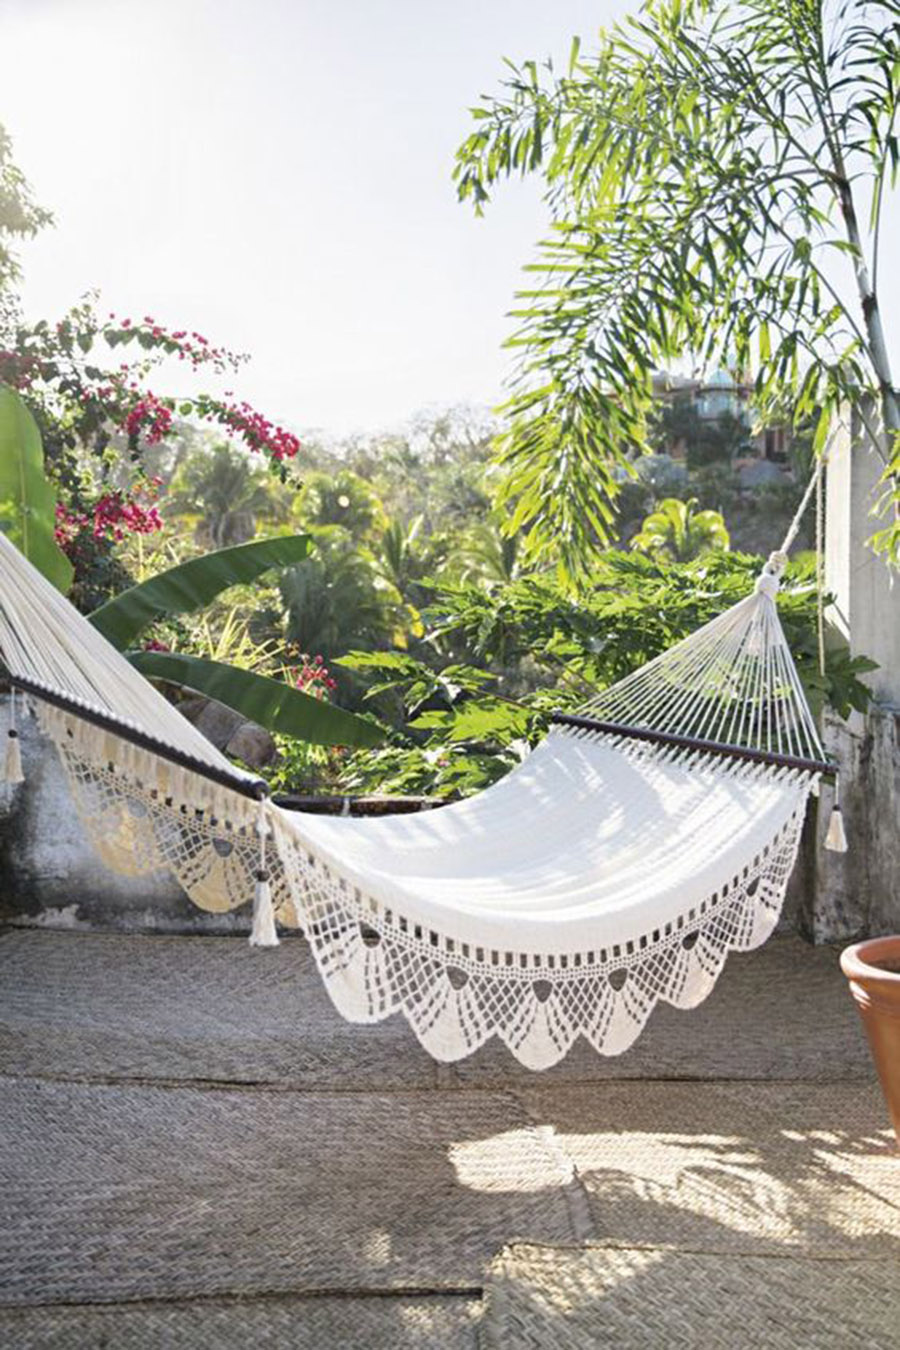 Hammock, Outdoor Home Decor, Patio Ideas, Backyard Inspiration